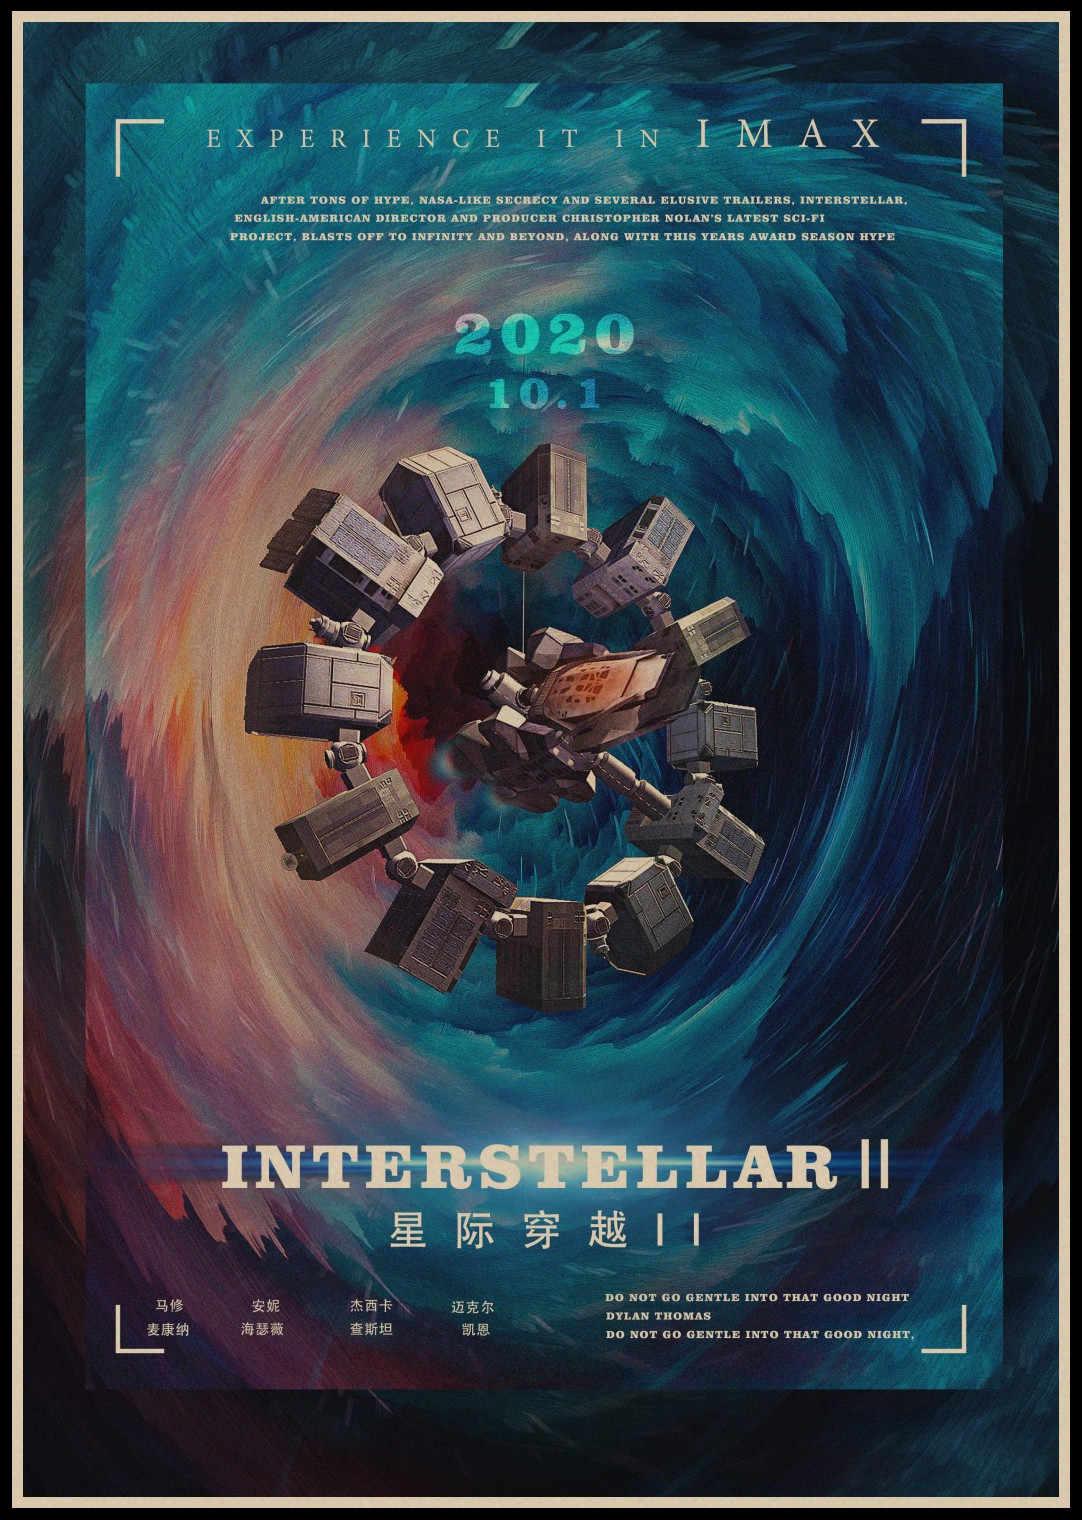 Interstellar Poster Retro Movie Kraft Paper Posters Decorative Painting Core Wallpaper Mural Stickers Wall Sticker Wall